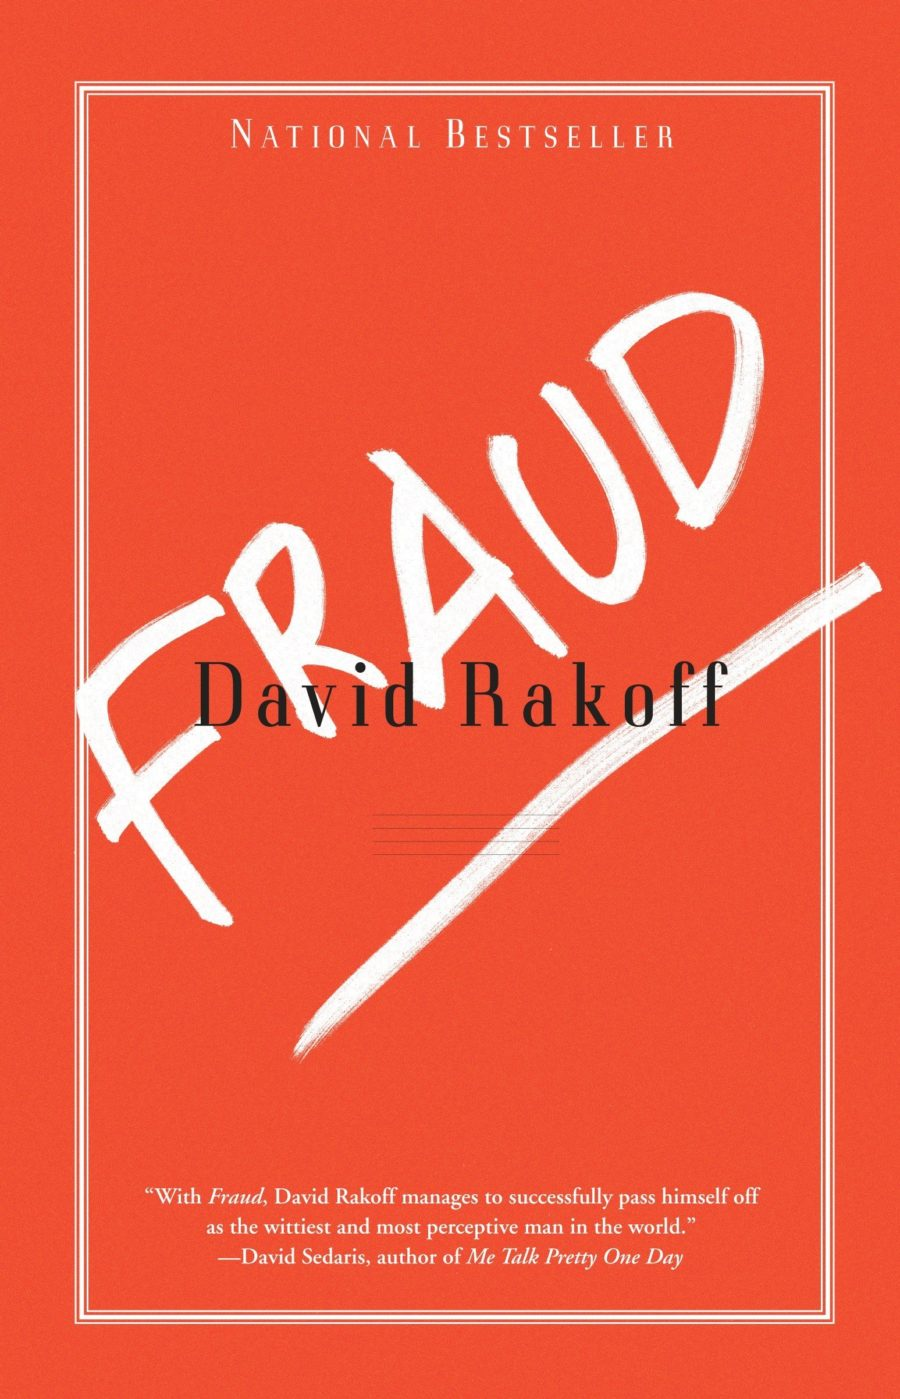 FraudRakoff